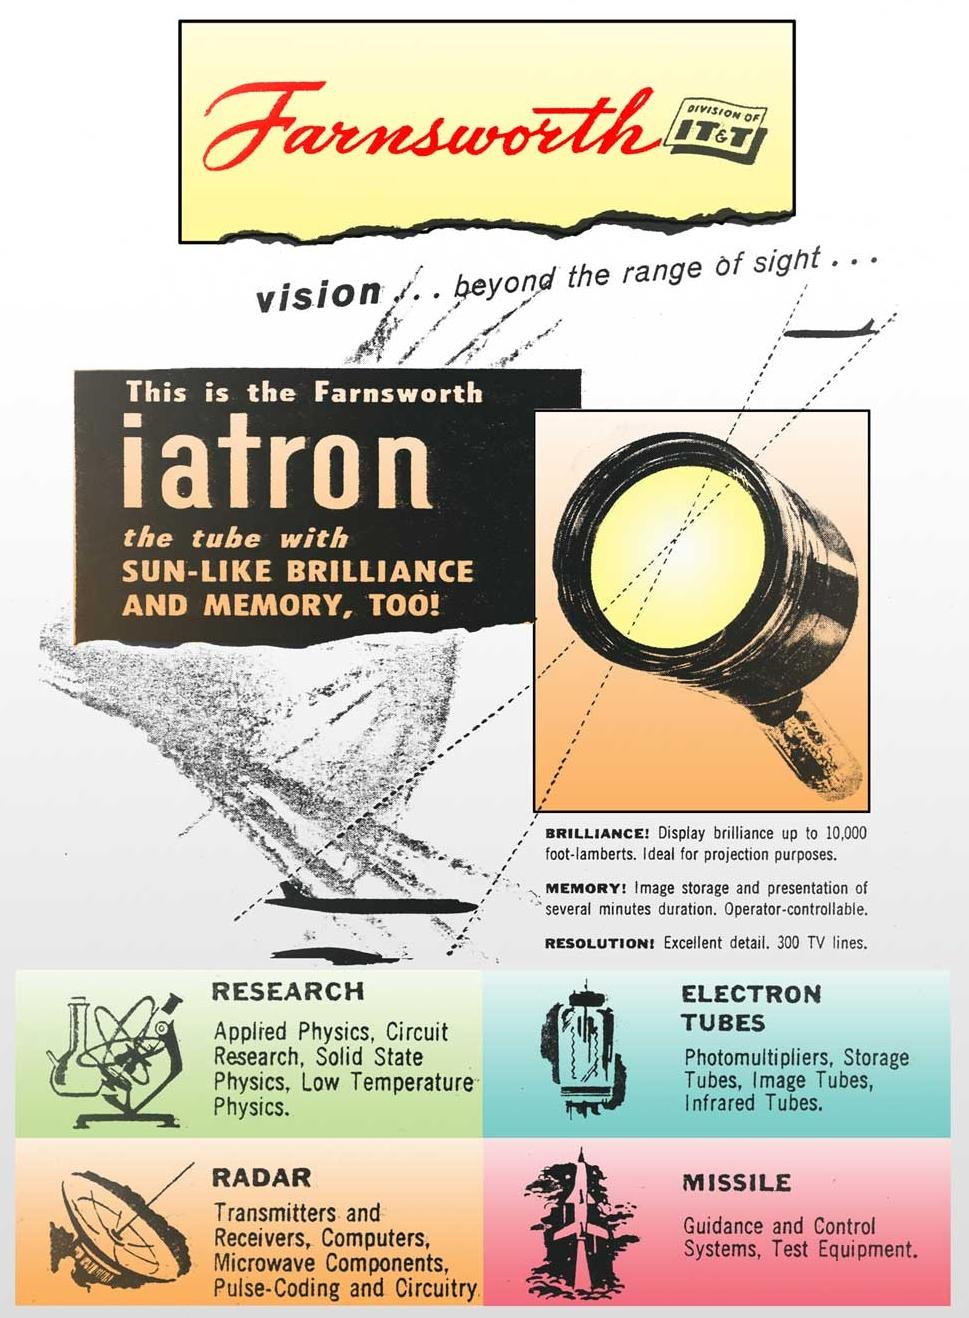 Iotron-Ad_resize.jpg